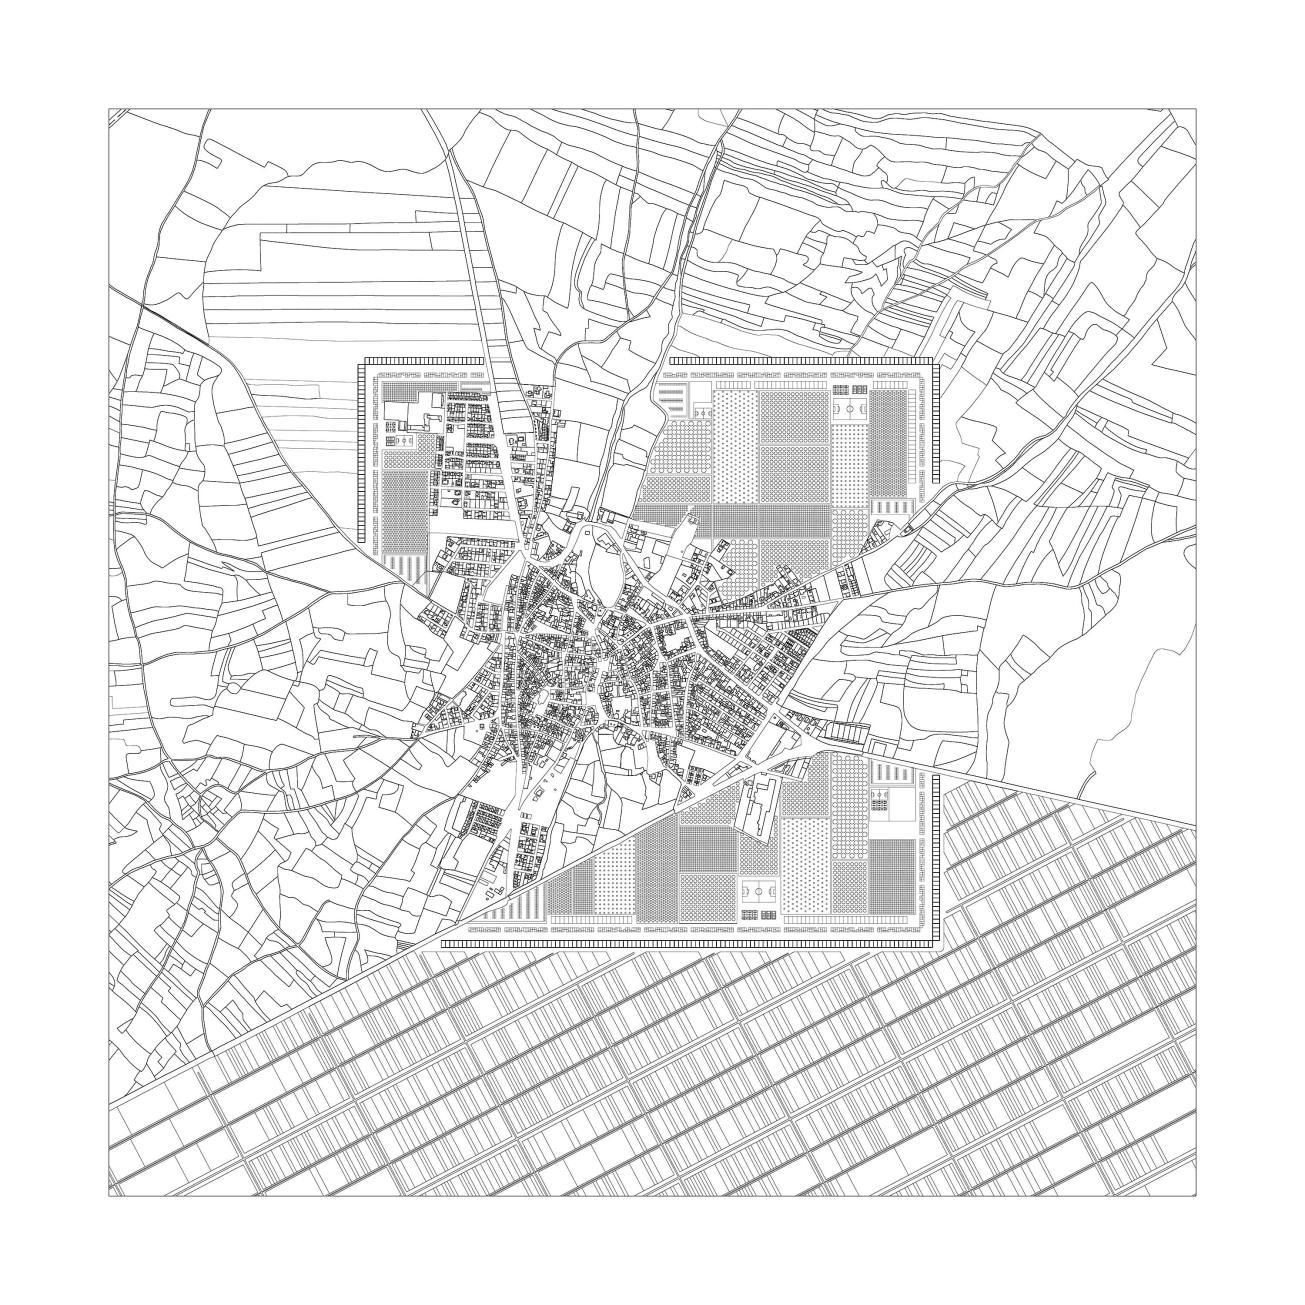 Villages 03 Settlement Plan - Cebolla, Toledo